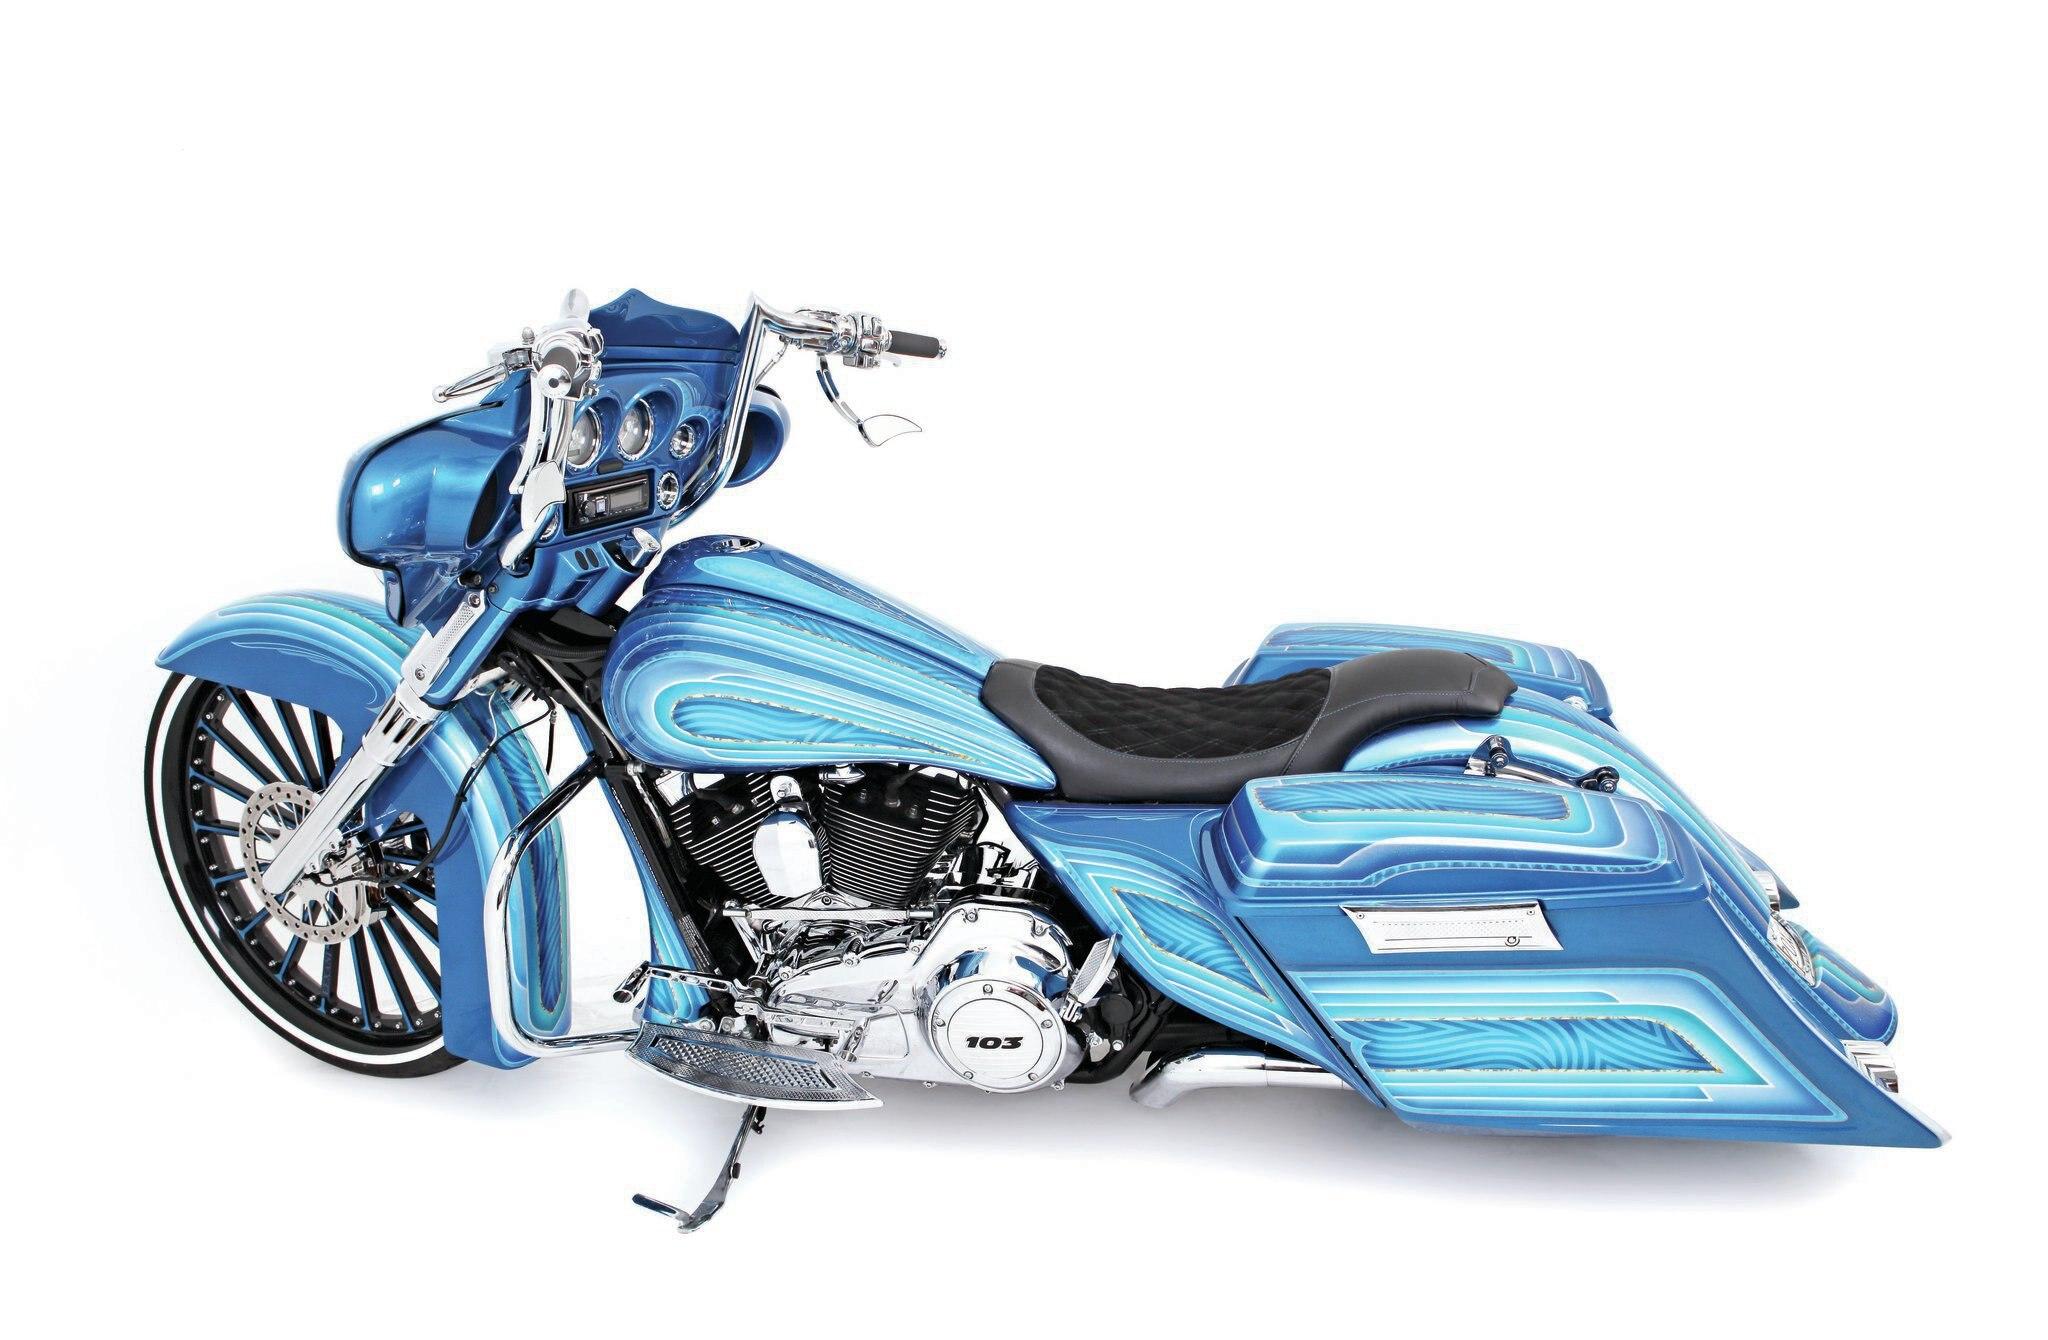 2012 Harley Davidson Street Glide Gangster Glide